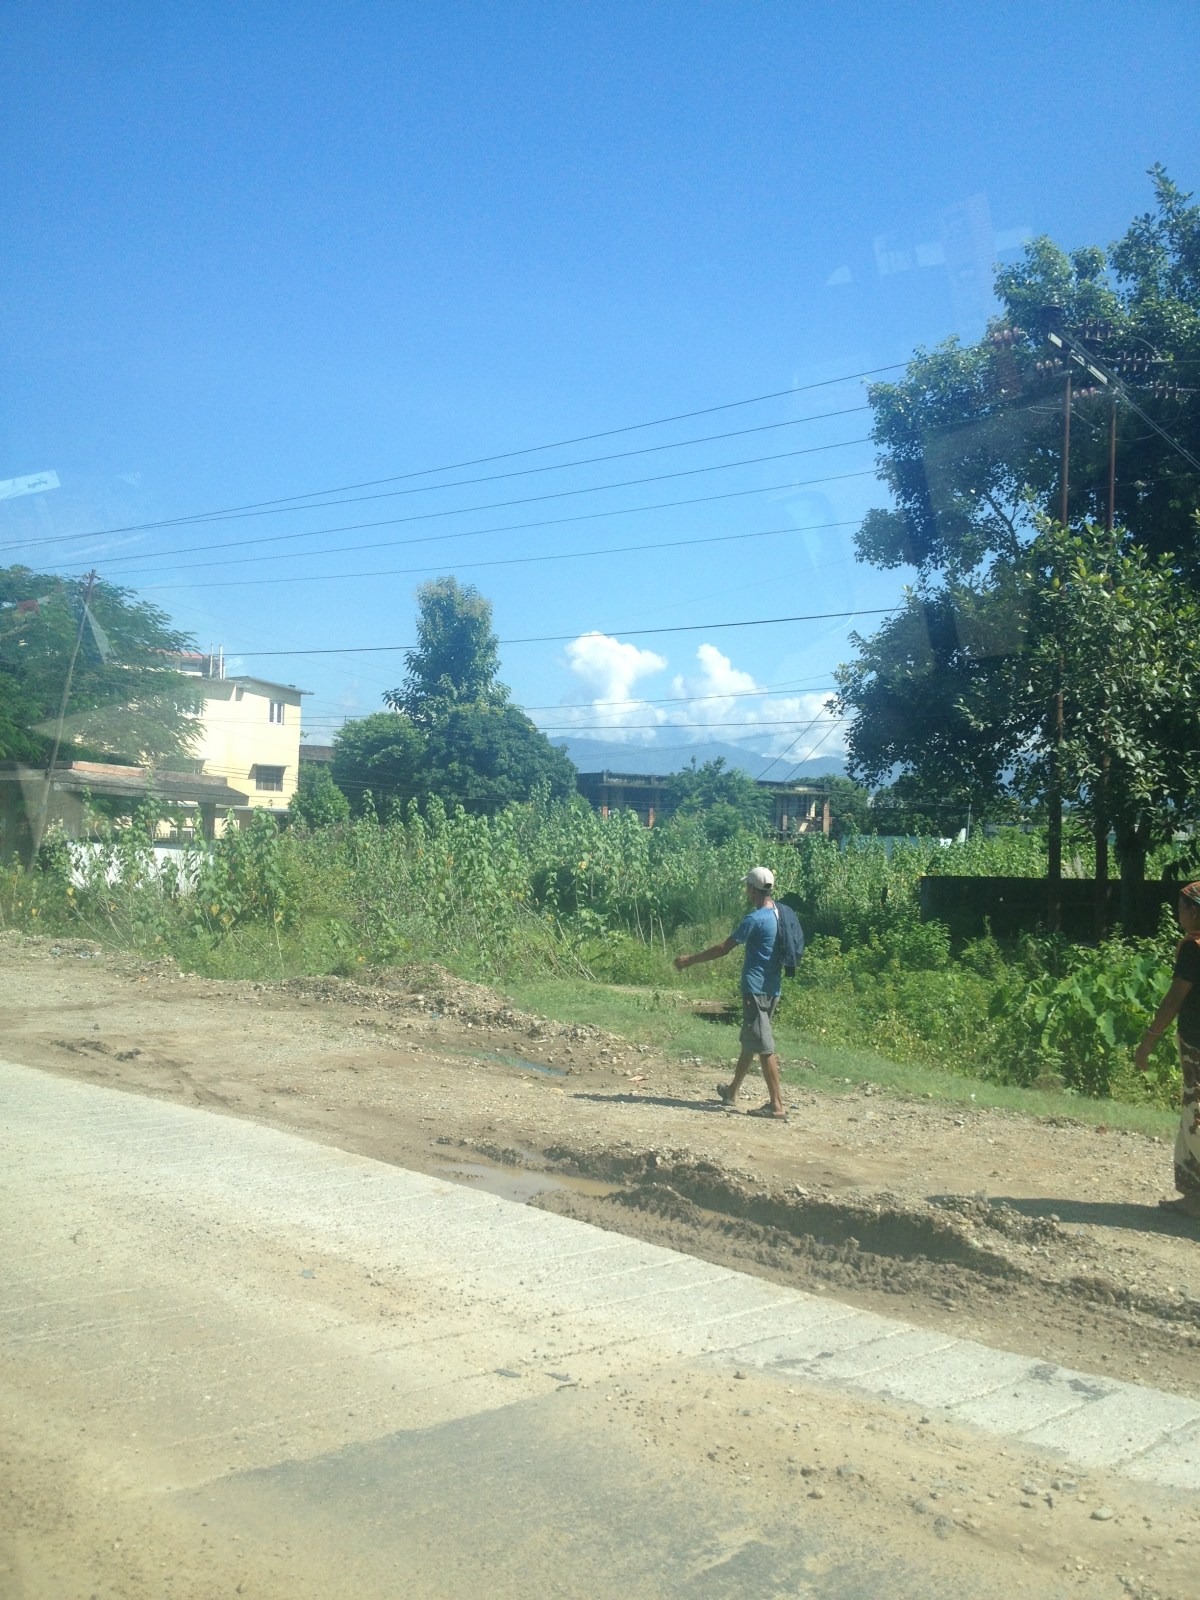 Nepal Travel: Teens Try to Scam Jennifer in Kathmandu